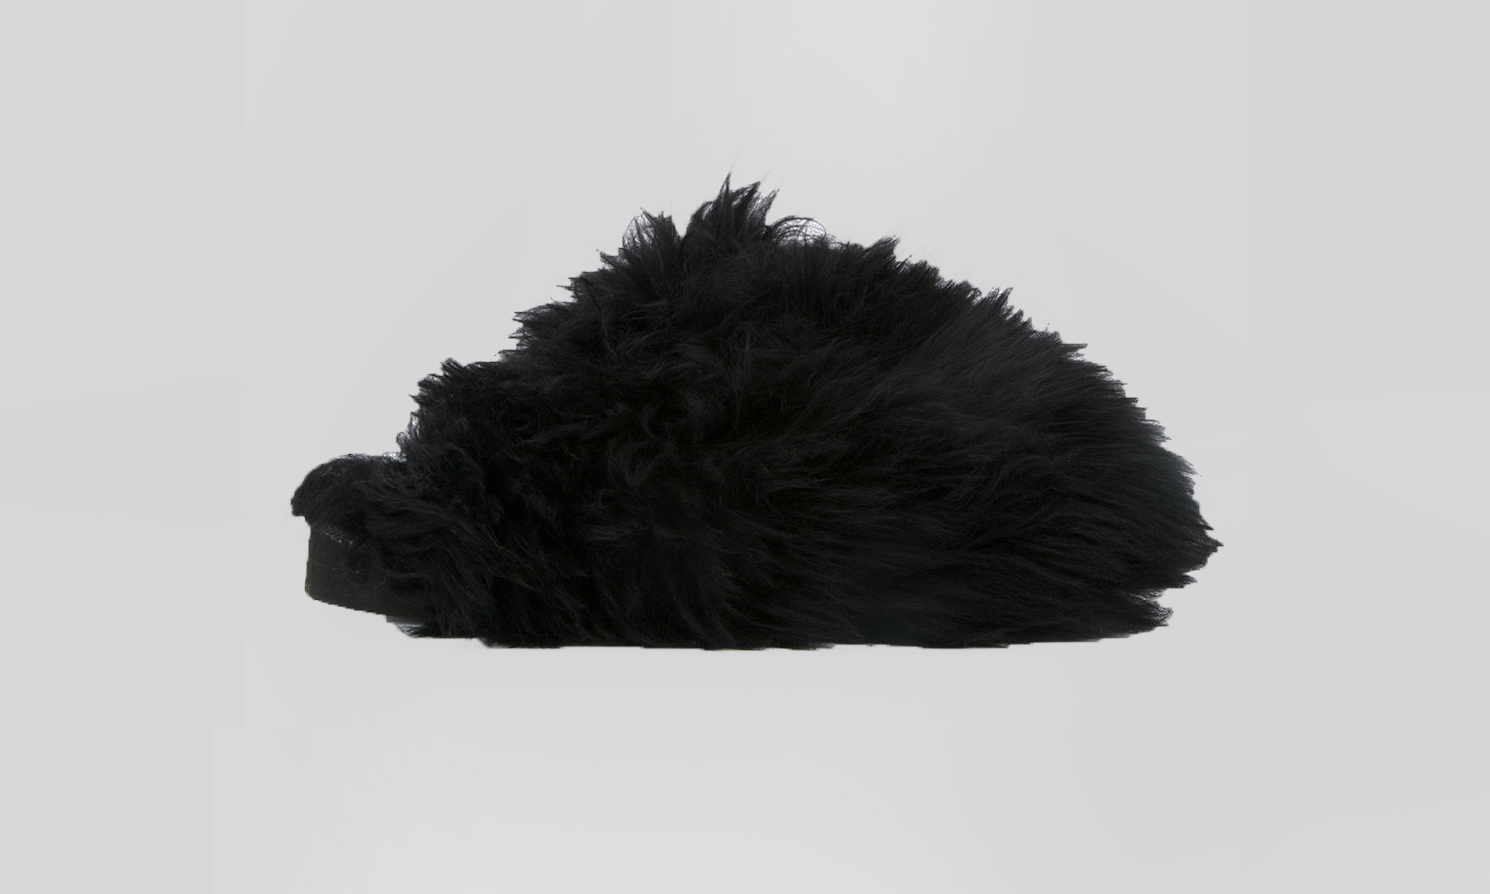 Ex-Ugg Merino Snow Slippers